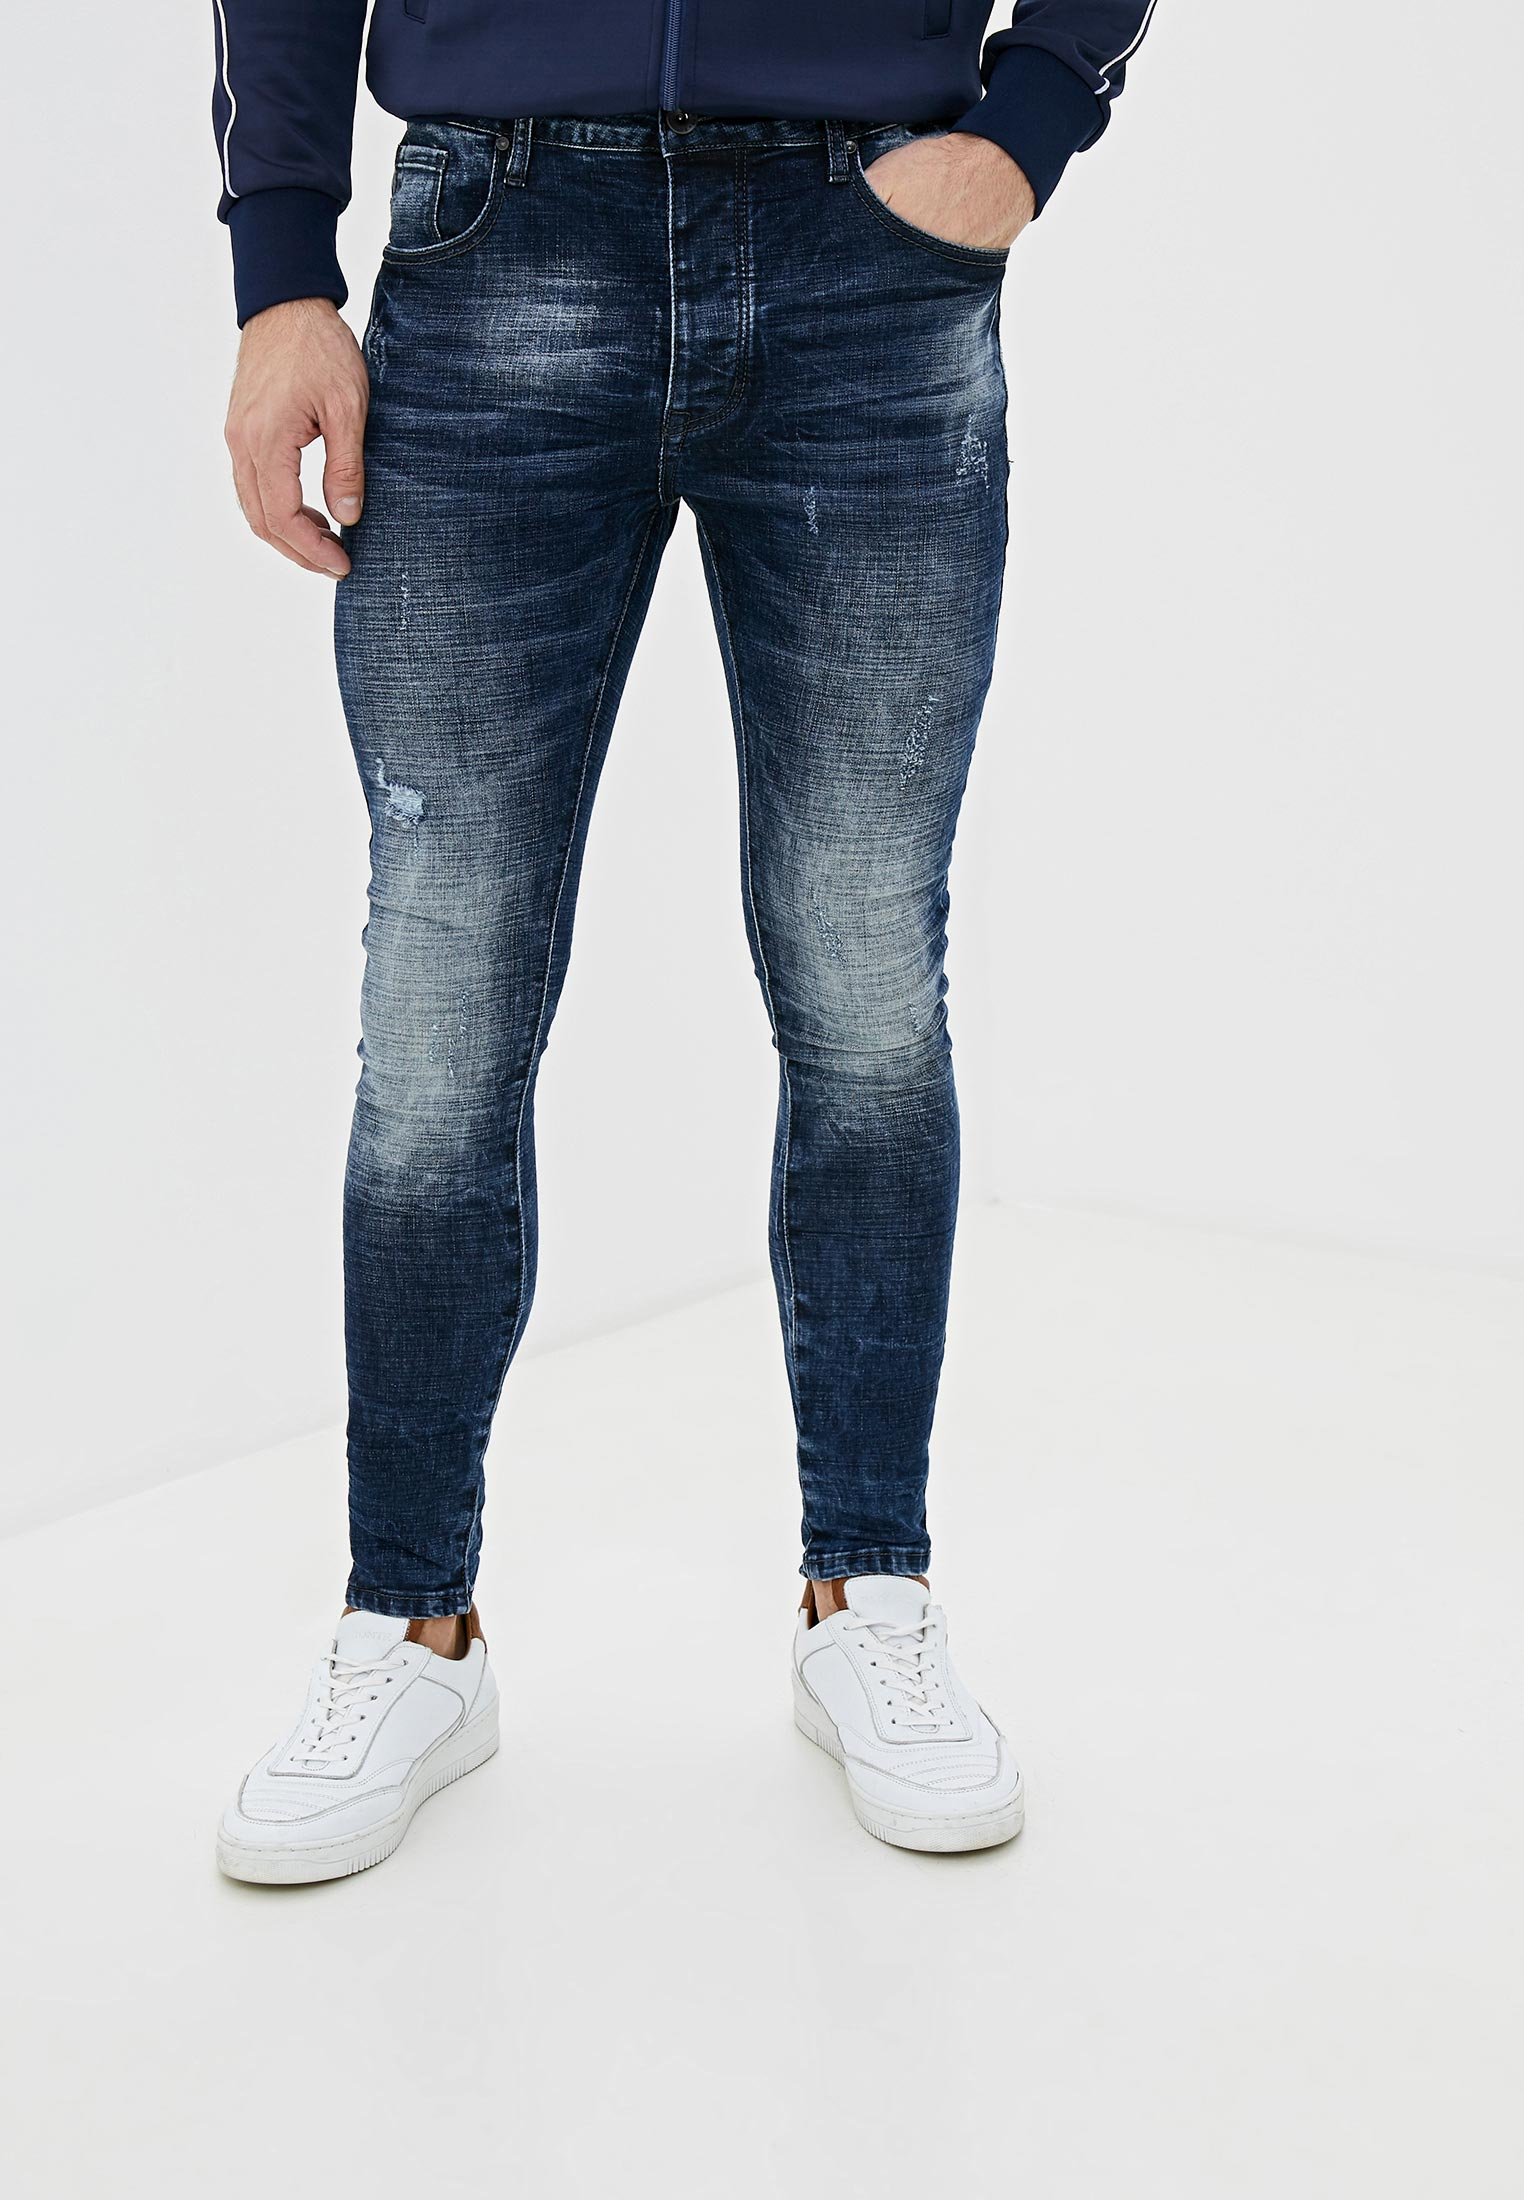 Зауженные джинсы Terance Kole 66081